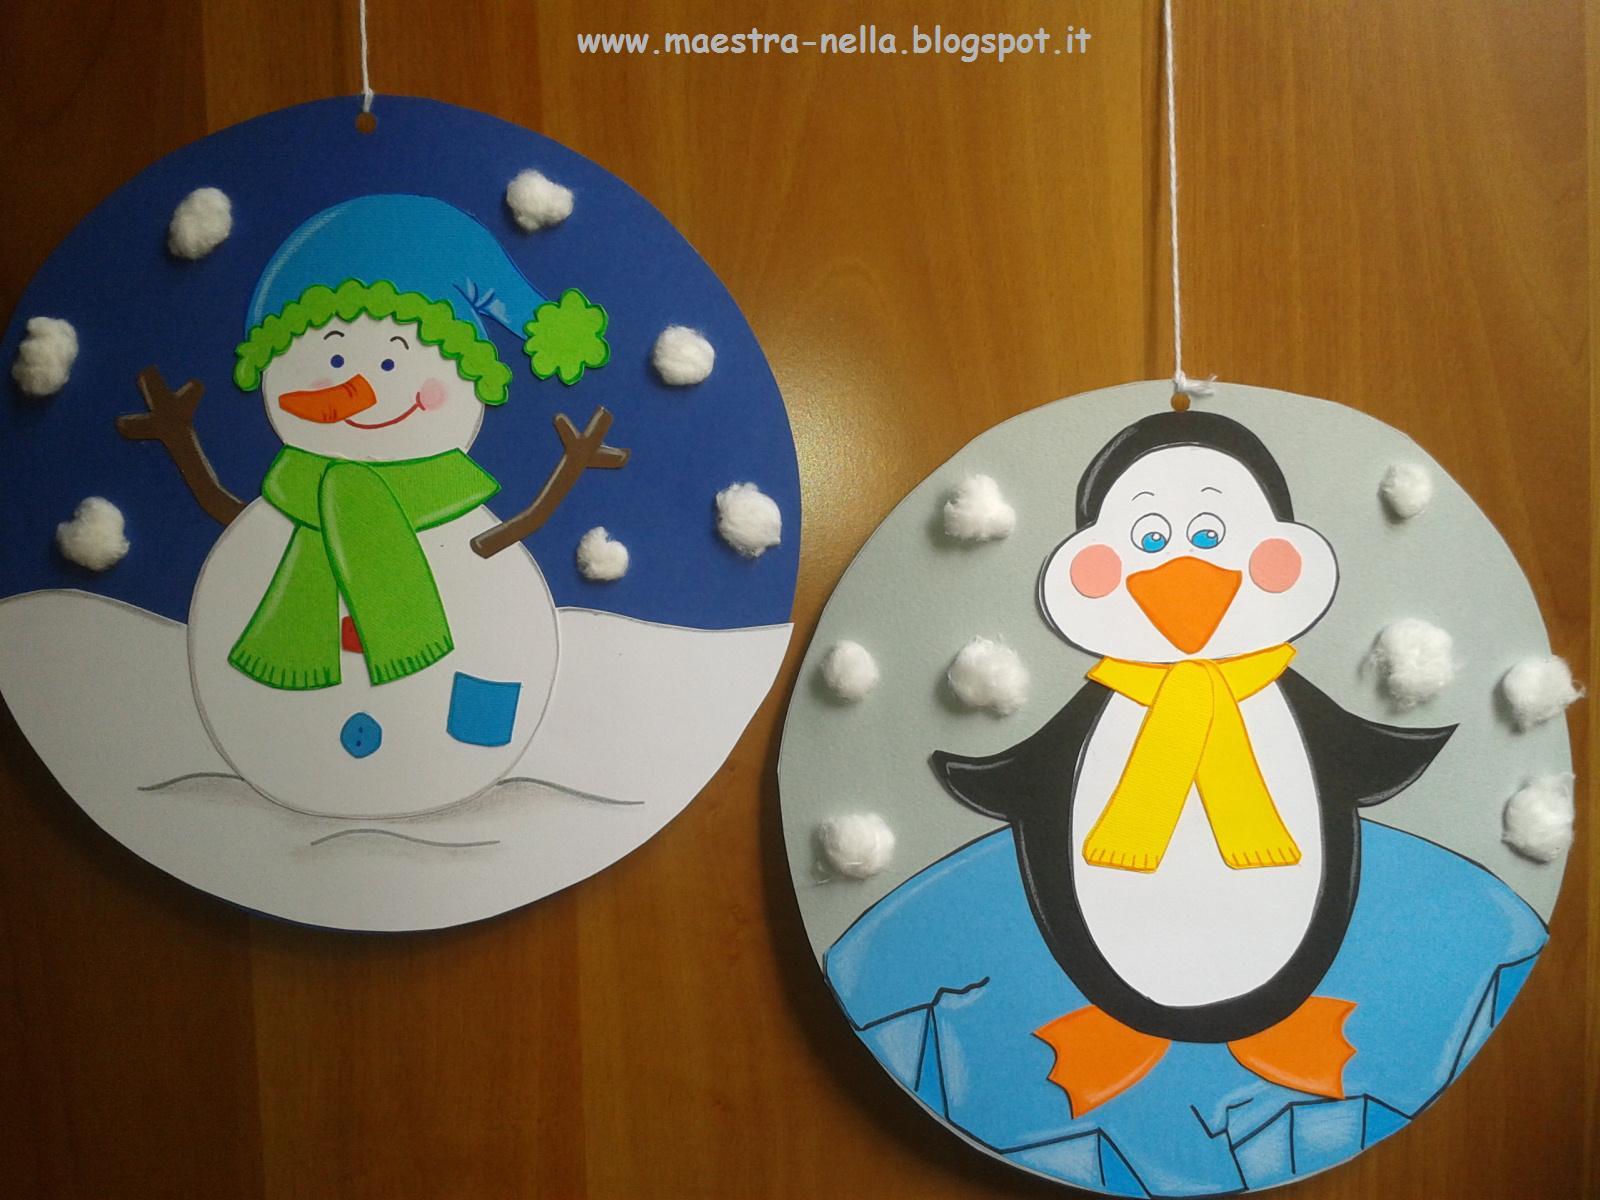 Maestra nella addobbi invernali for Addobbi natalizi scuola